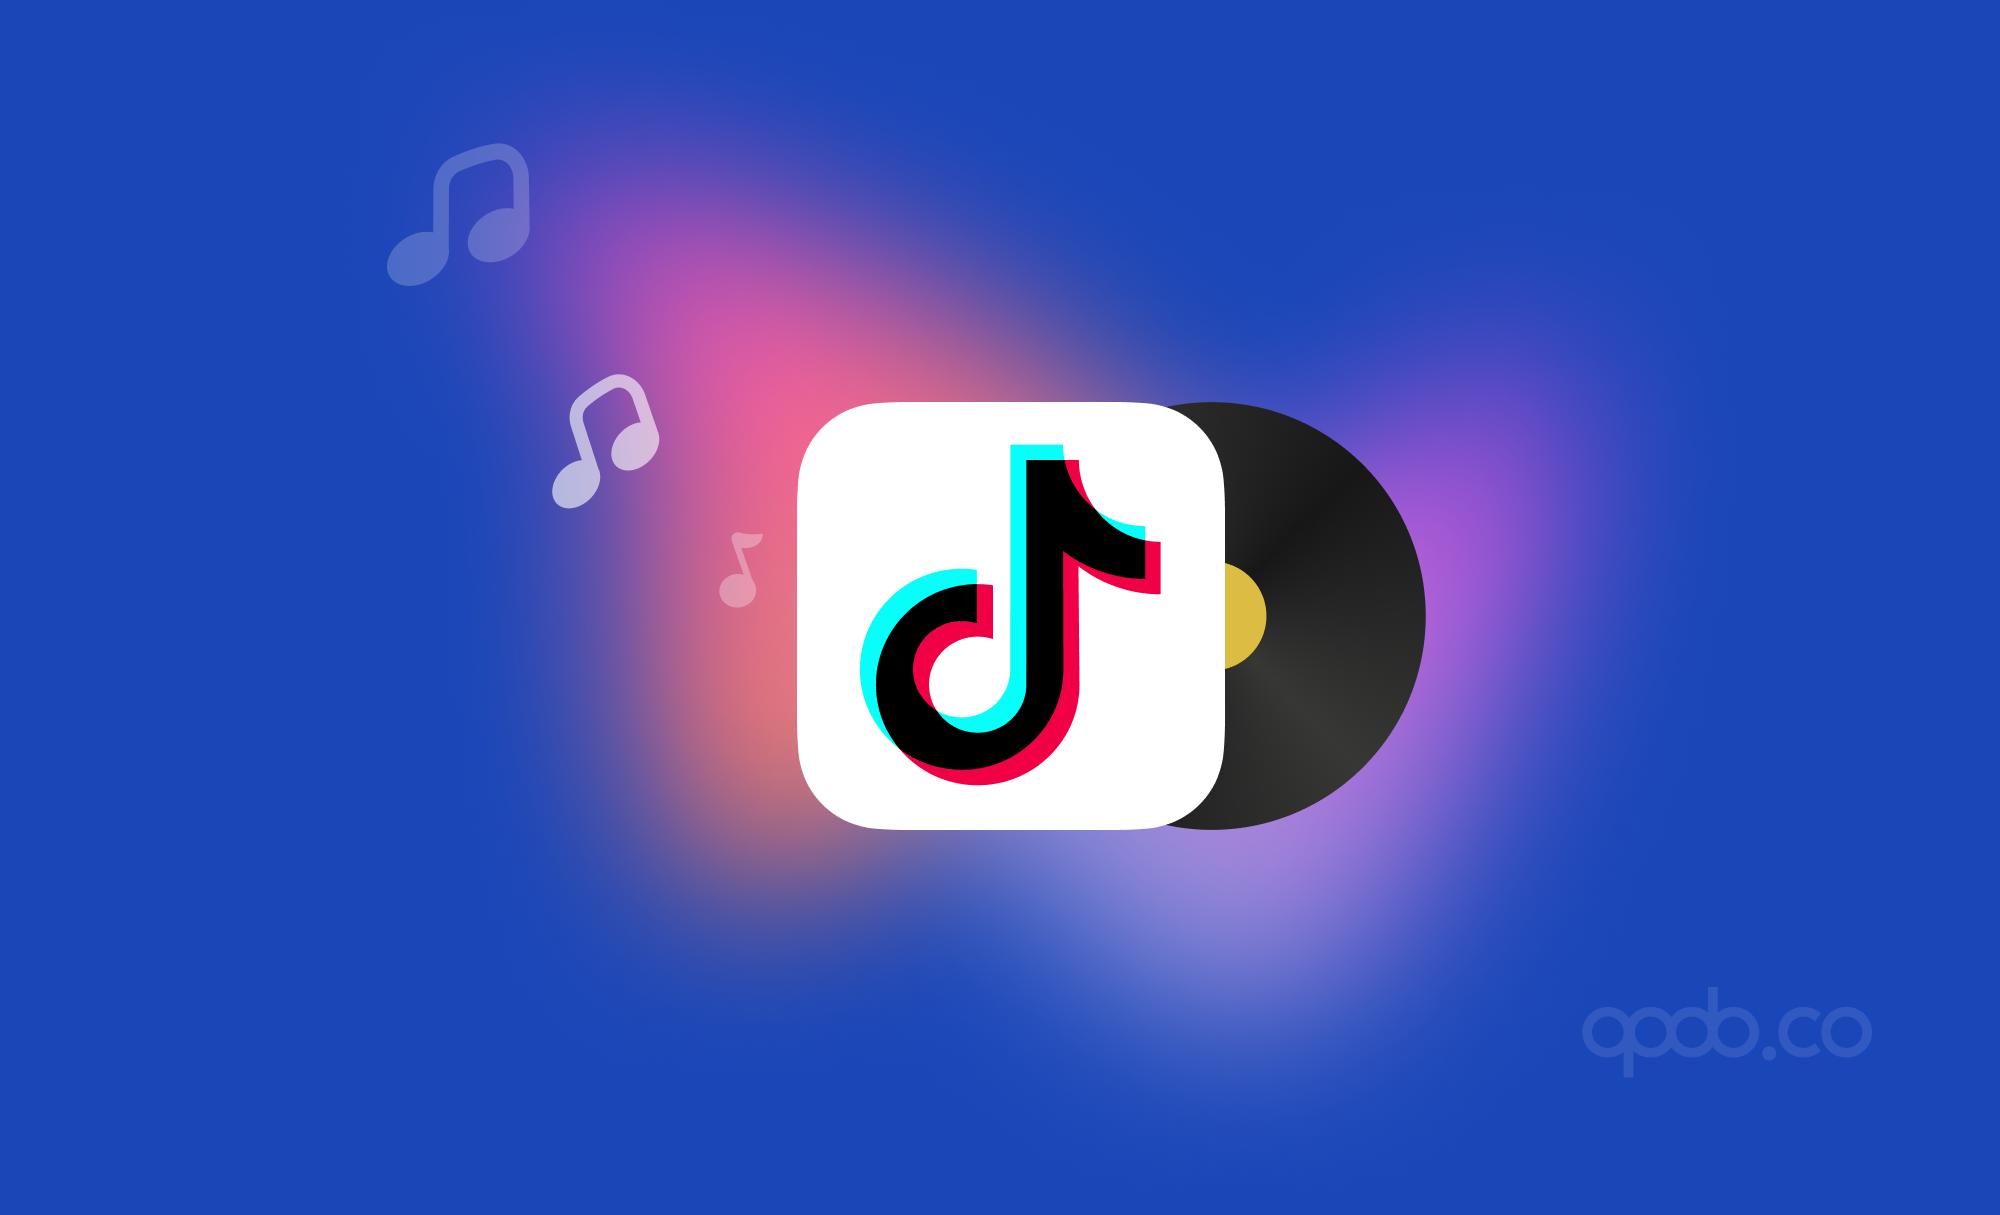 15 Most Trending TikTok Songs In 2021